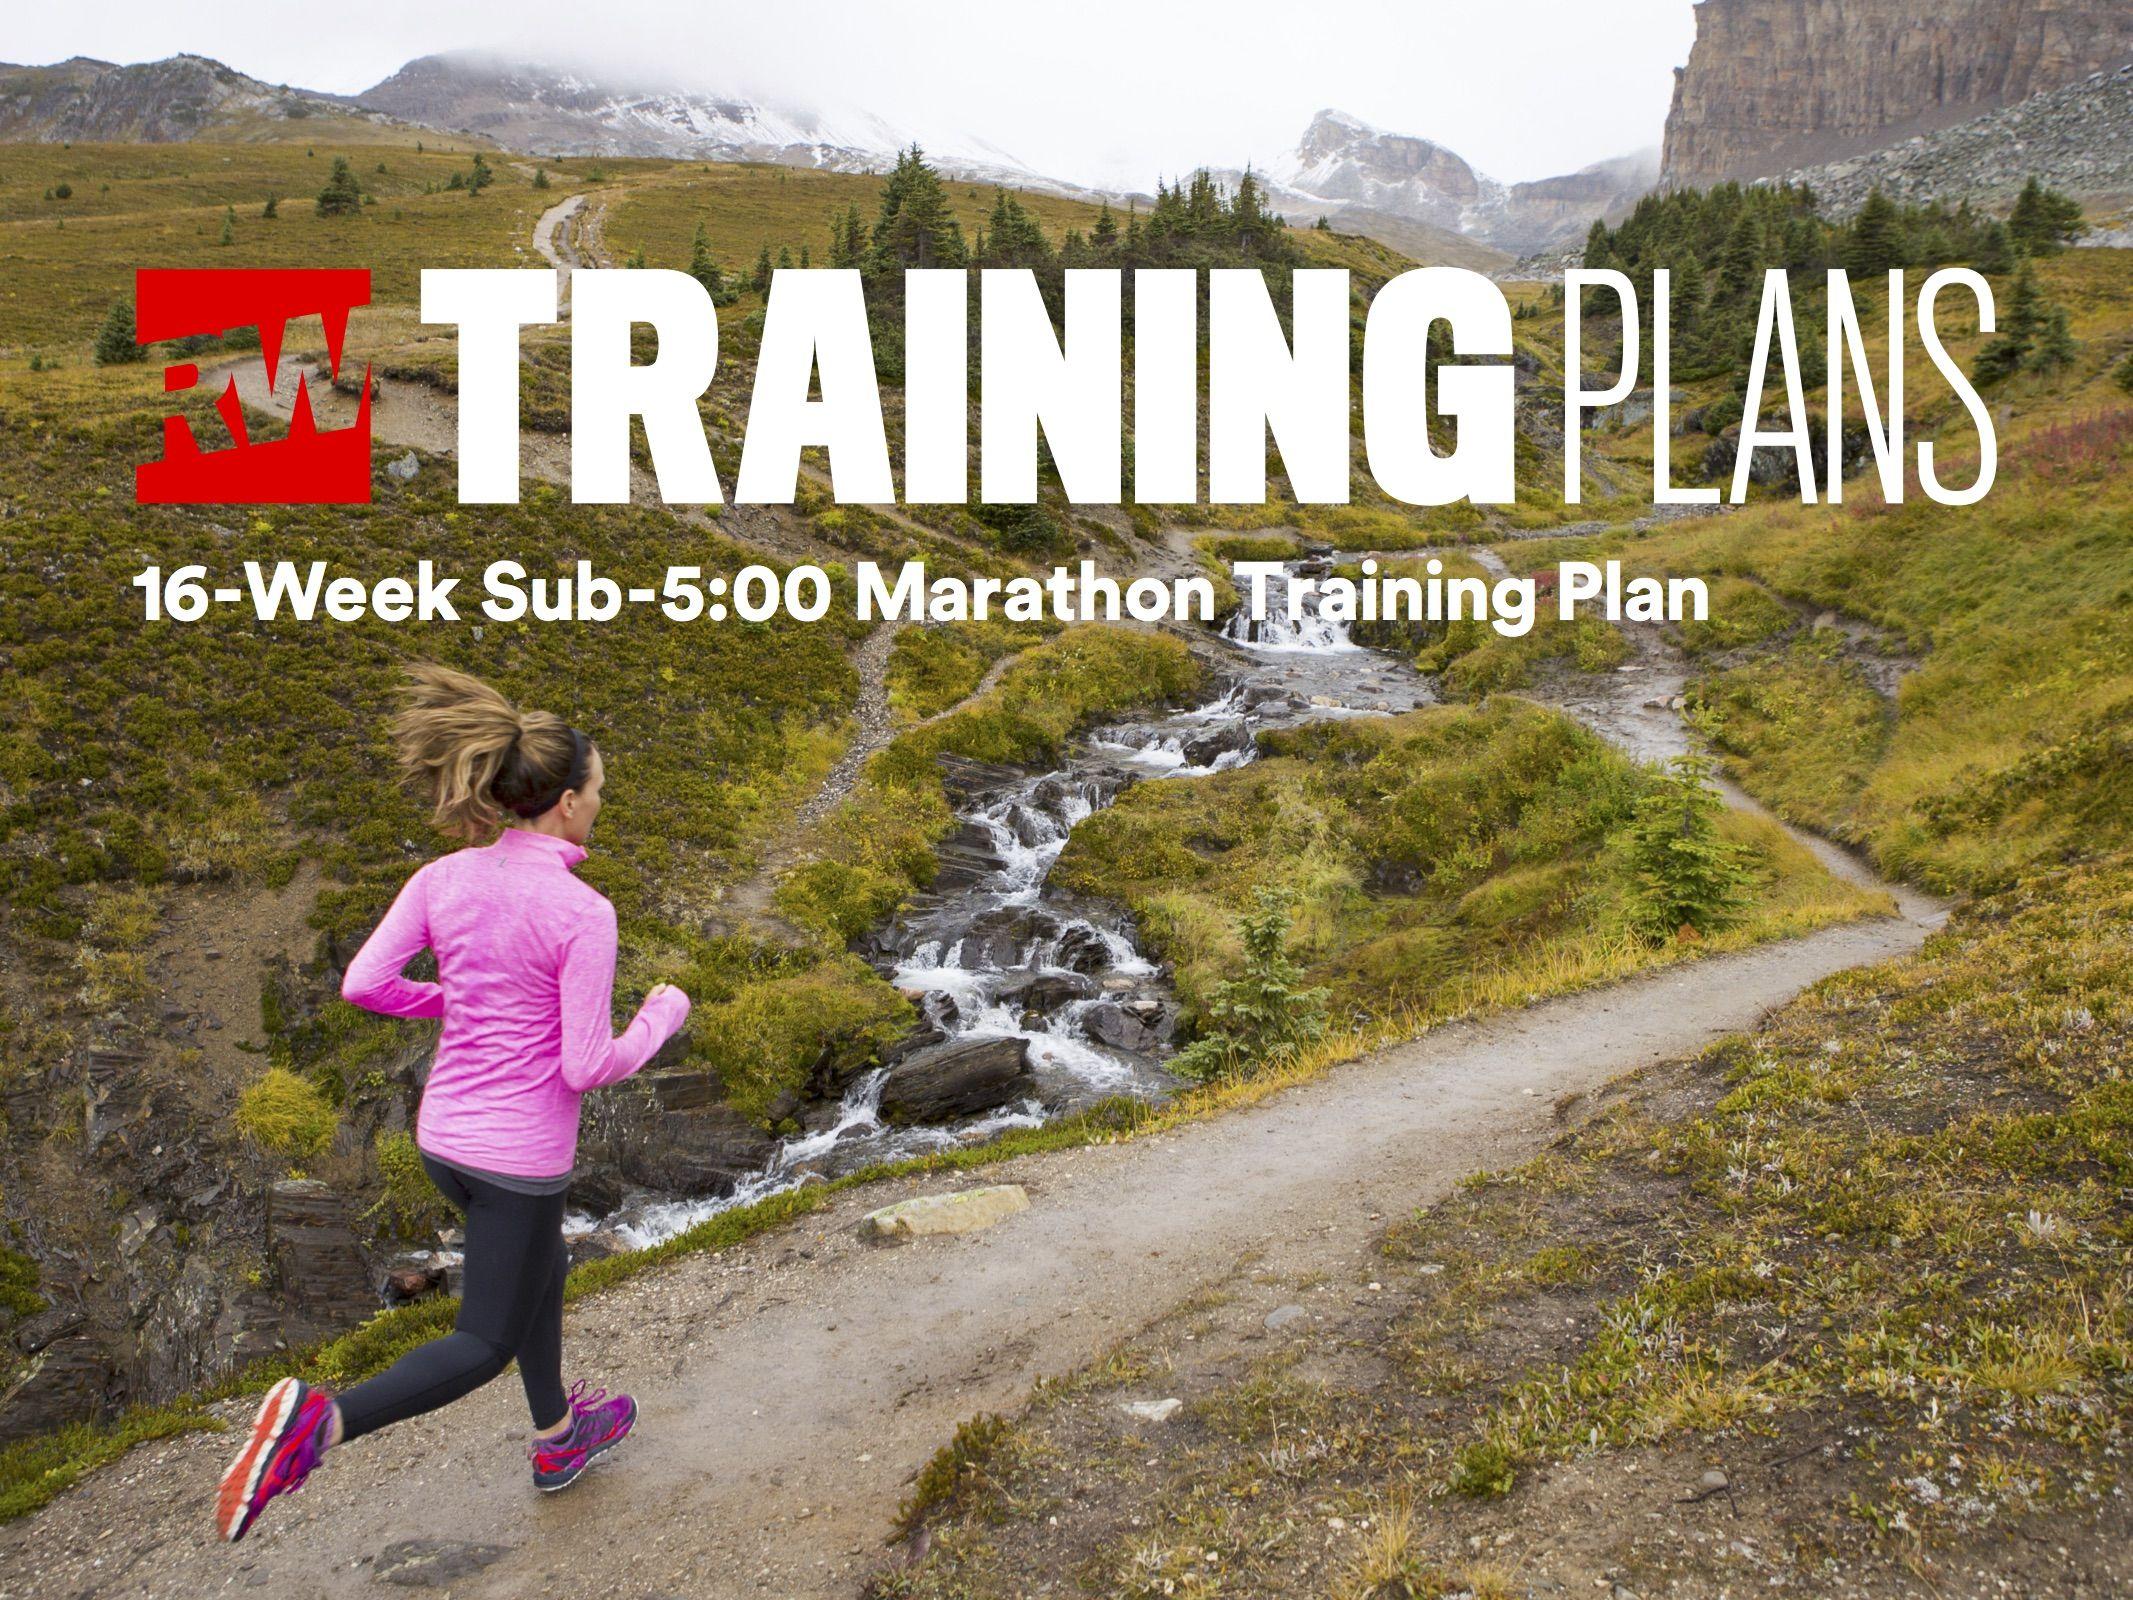 RW's Ultimate 16-week marathon training plan for runners looking to run sub-5.00